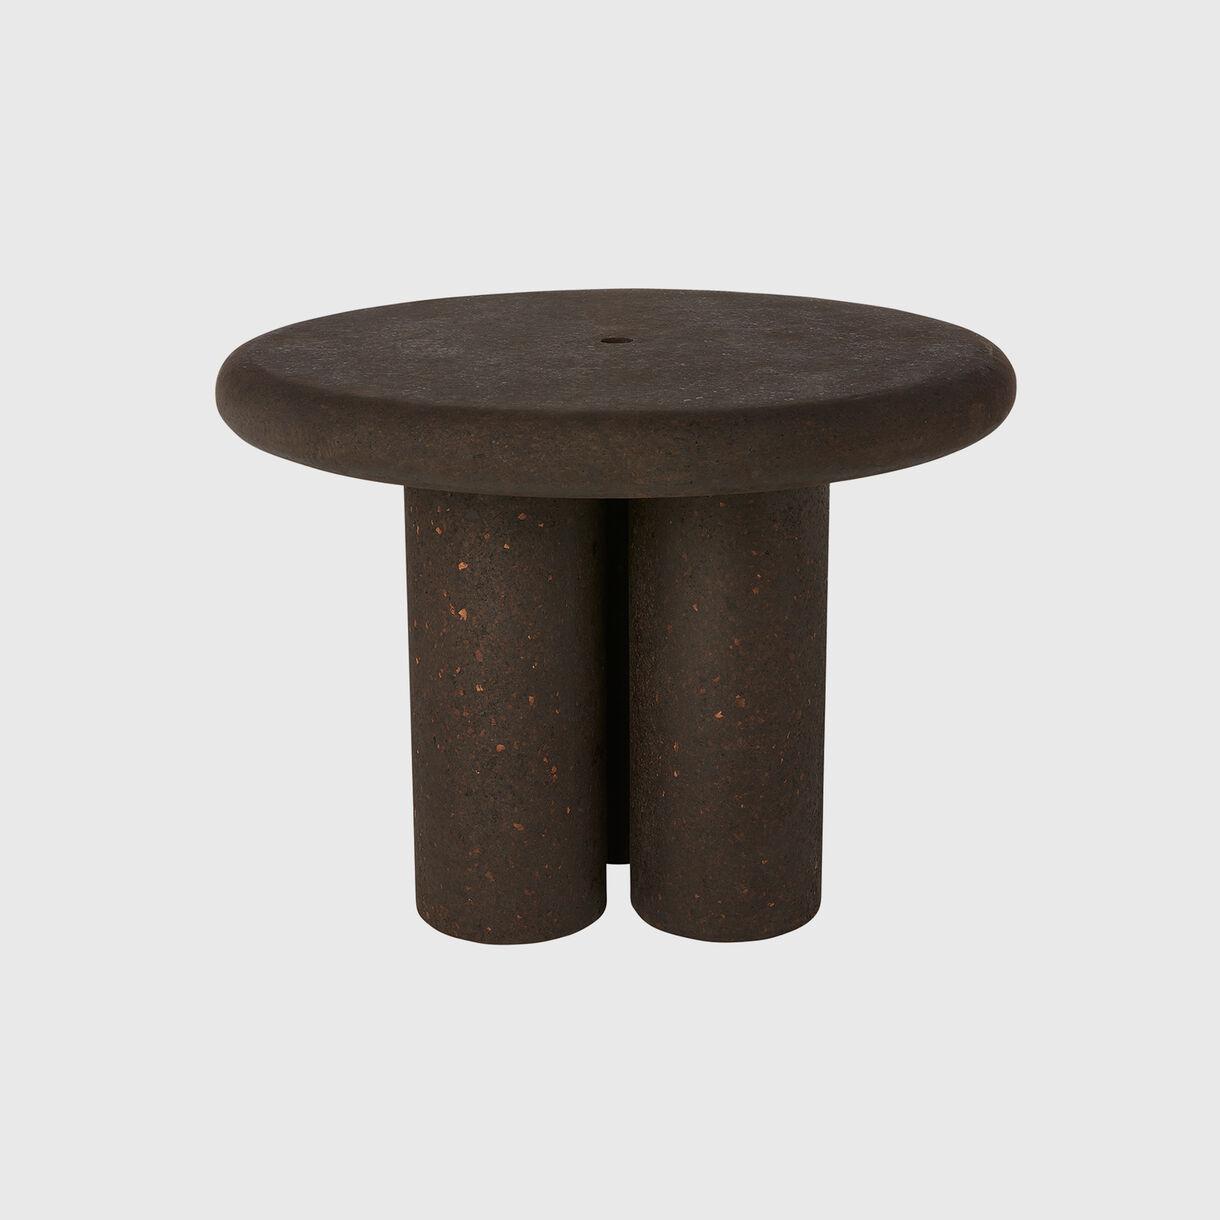 Cork Round Table, 1000mm